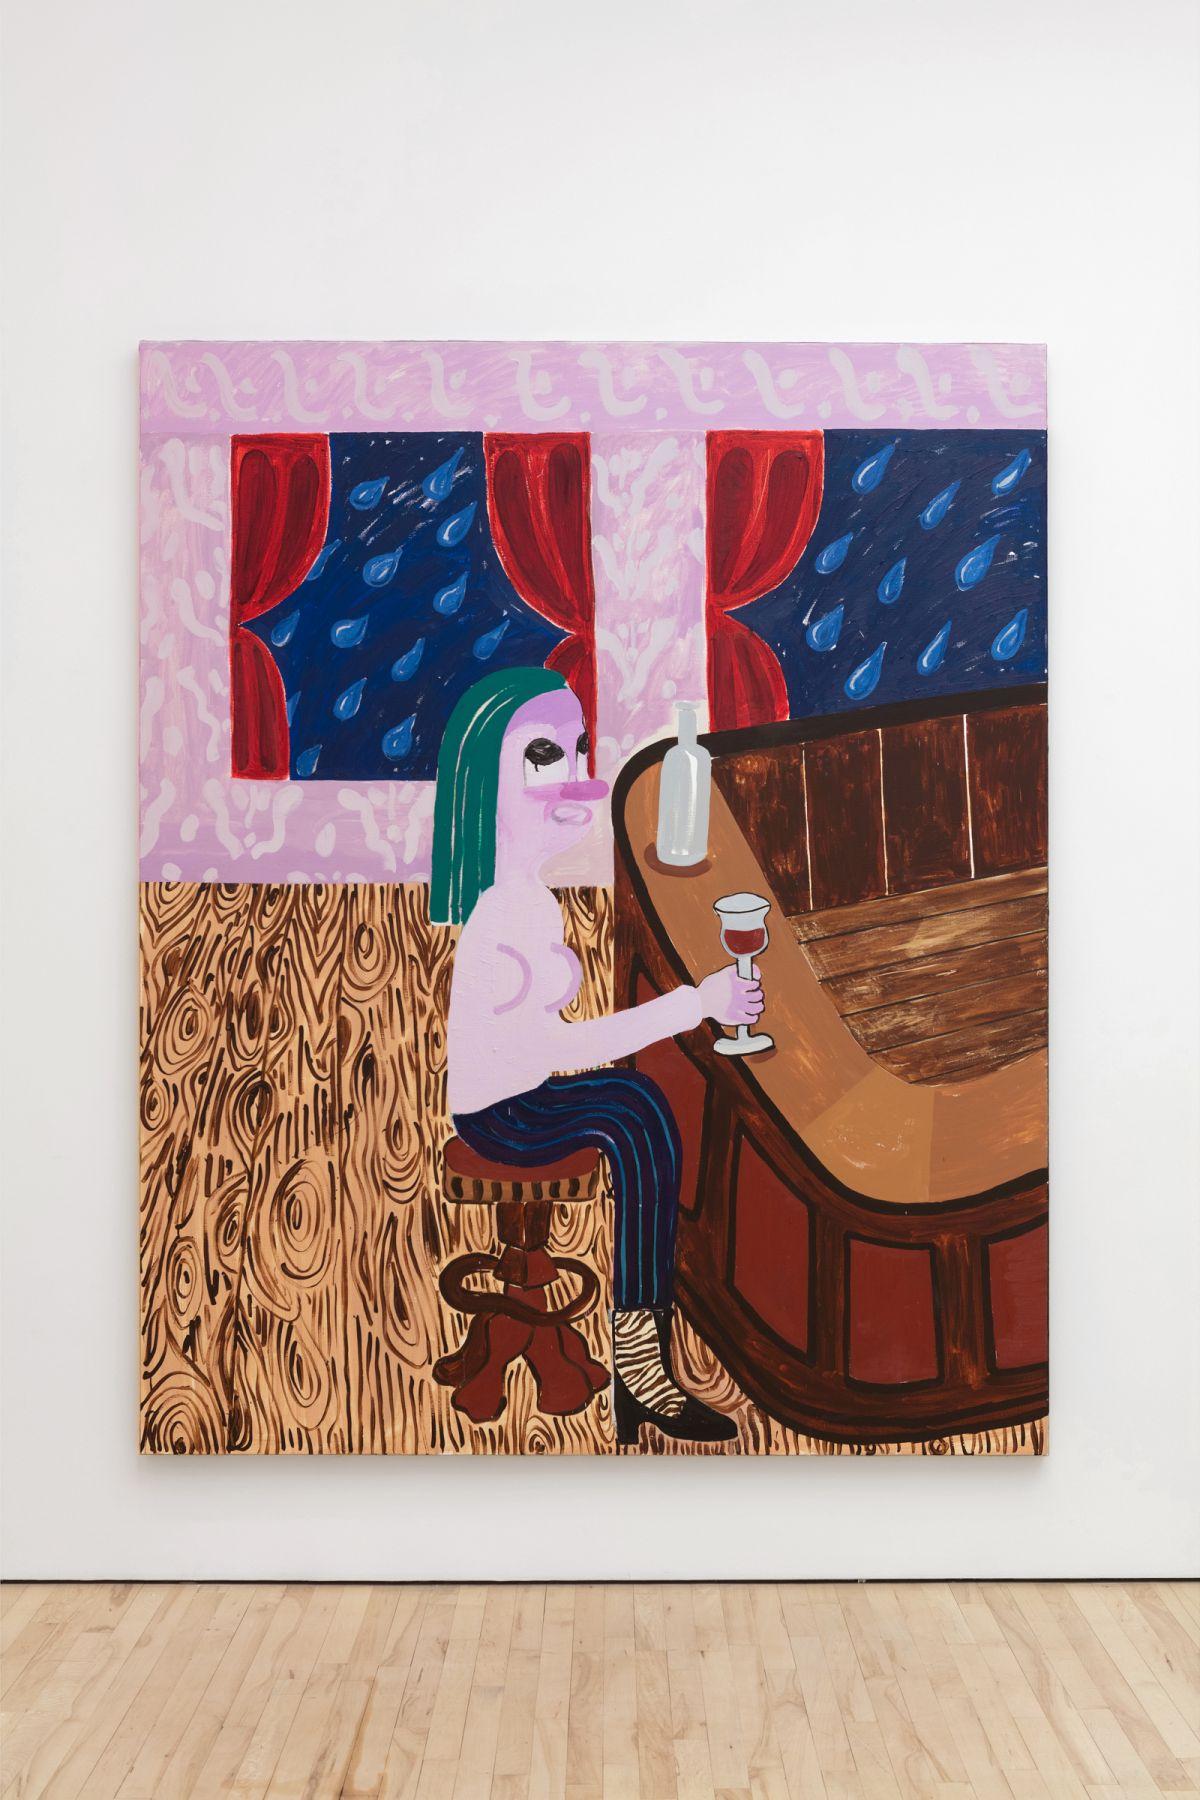 Nel Aerts The Village Idiot, 2017 Acrylic, oil, oil sticks, velvet and corduroy on canvas 220 x 180 cm (NA110)